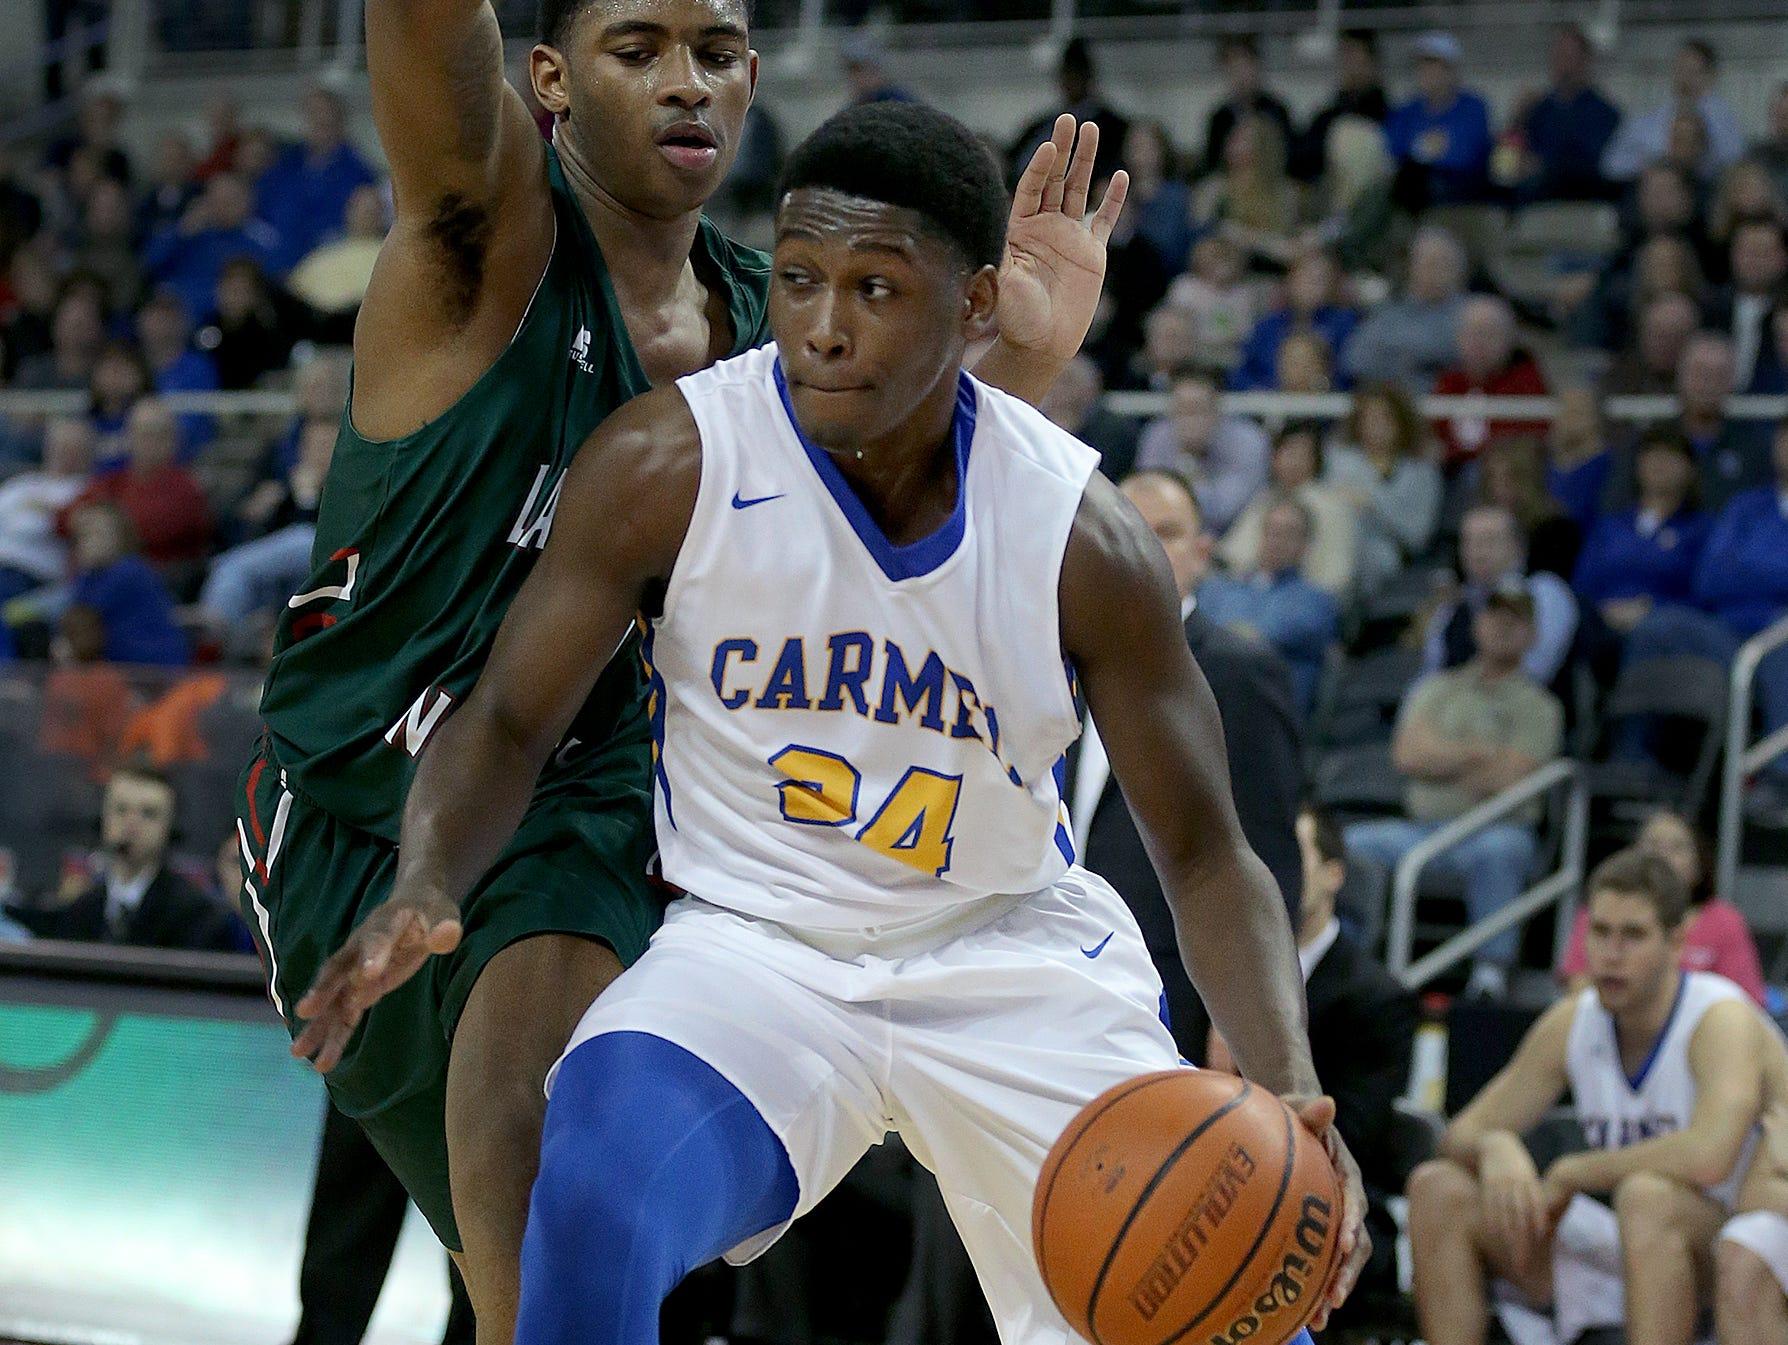 Carmel's Garrett Covington (24) drives on Lawrence North's Kevin Easley Jr. on Feb 4, 2016 at the Indiana Farmers Coliseum.